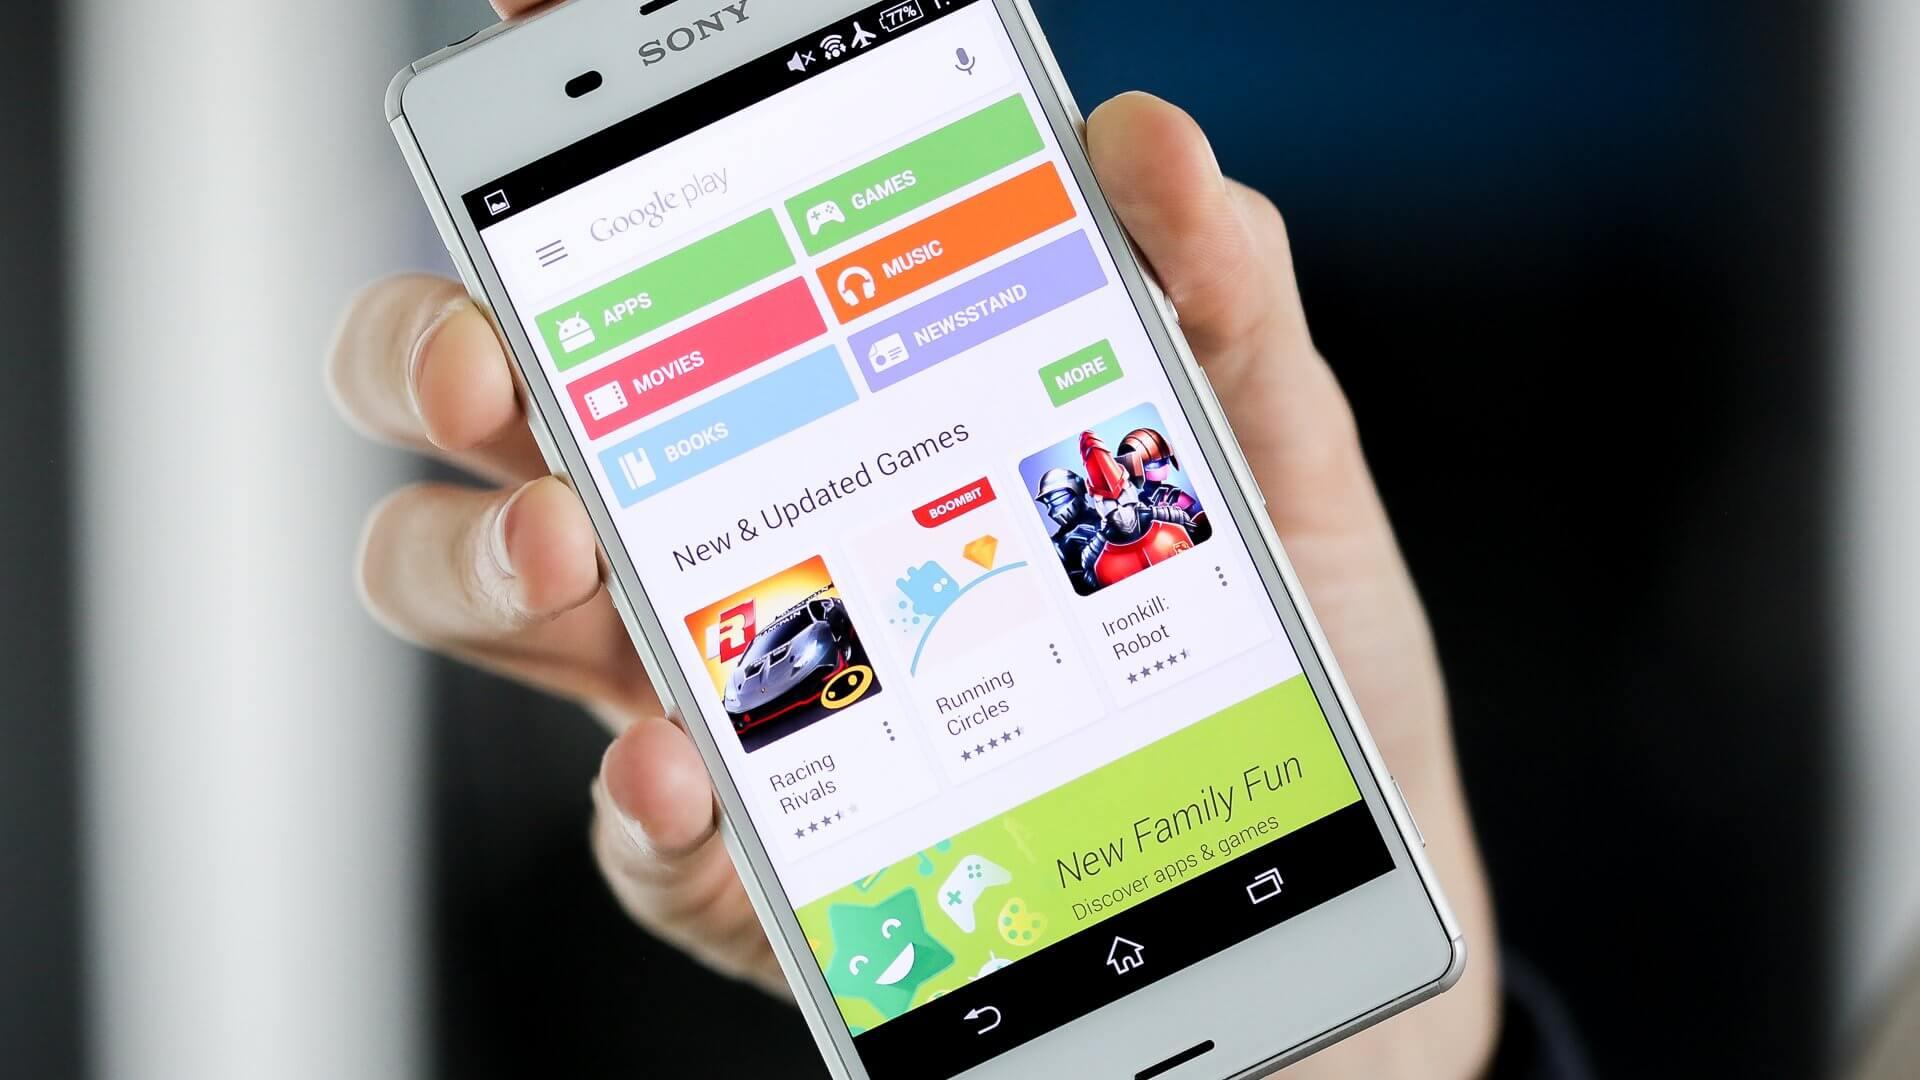 Google Play Store açılmıyor Google Play Store Açılmıyor Google Play Store Açılmıyor Sorununa Çözüm play store acilmiyor